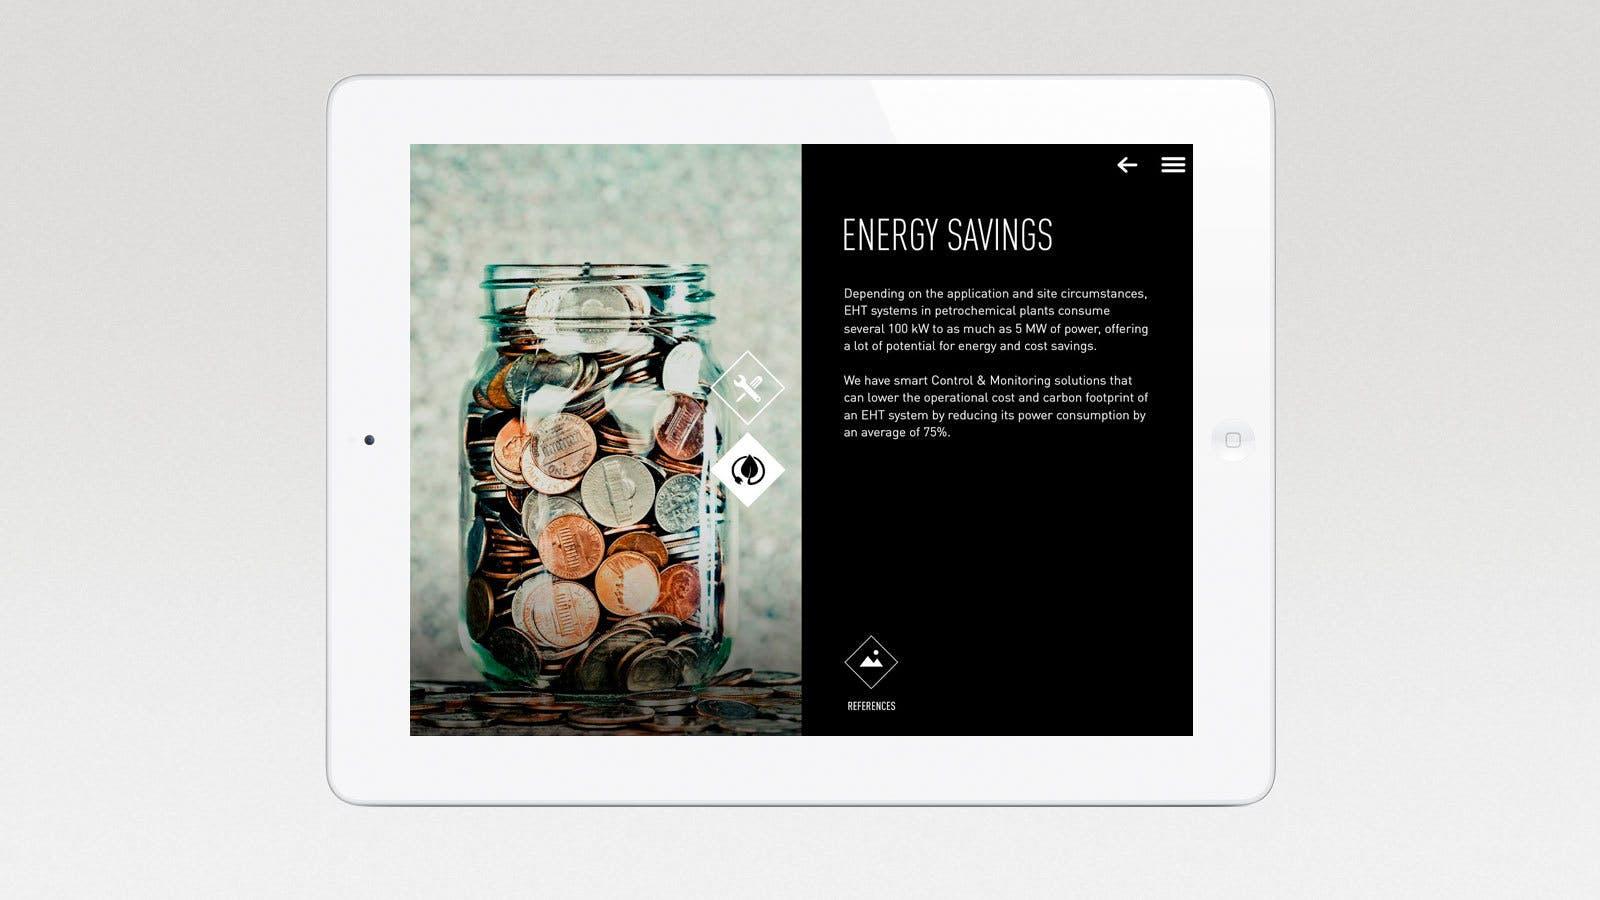 Nvent sales app G4